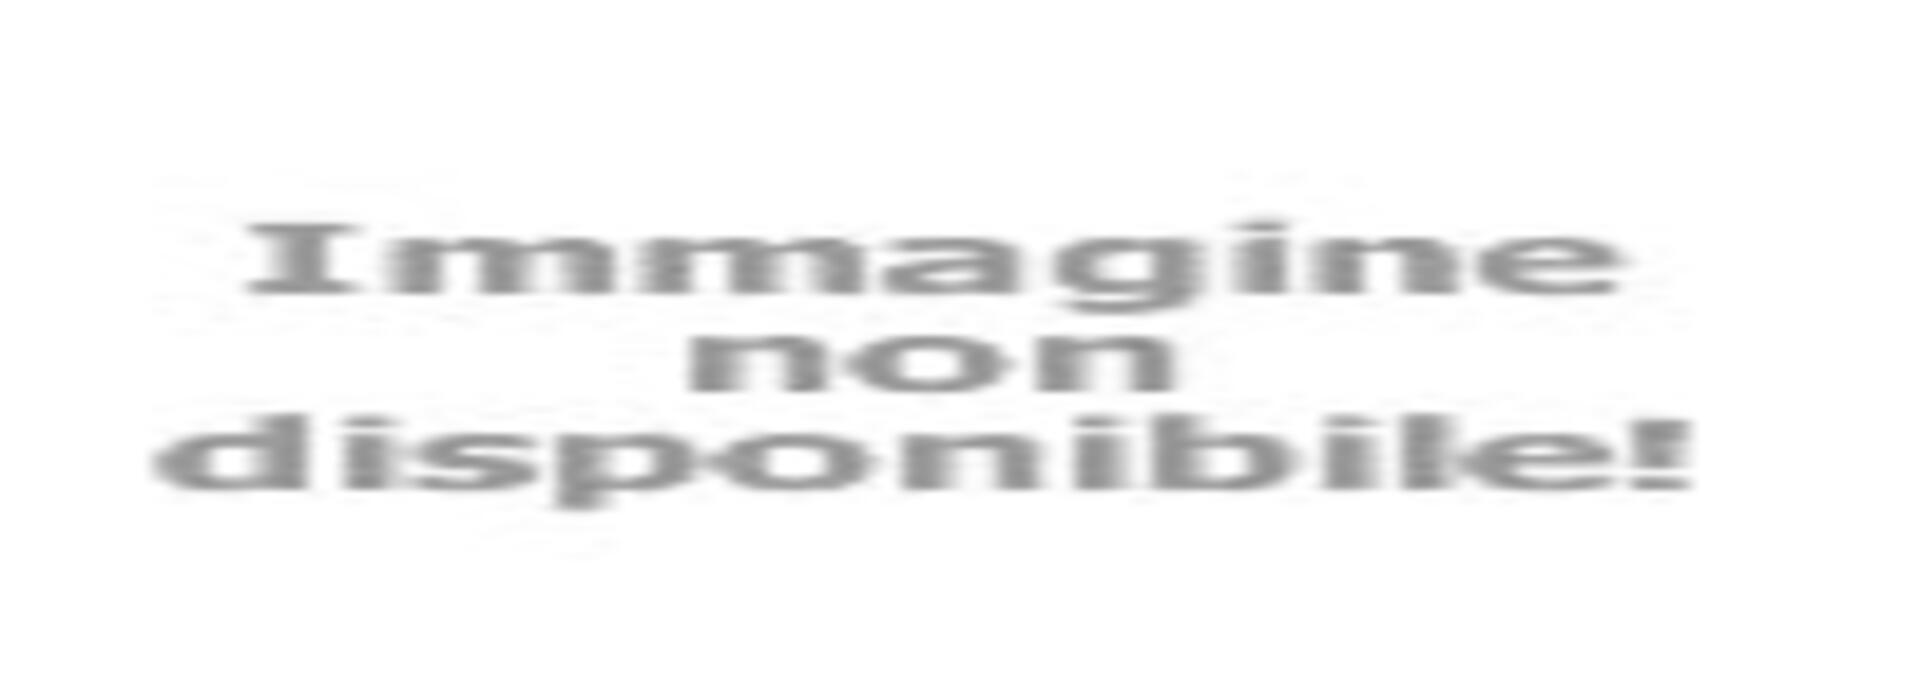 hotel-montecarlo fr go-kart 019